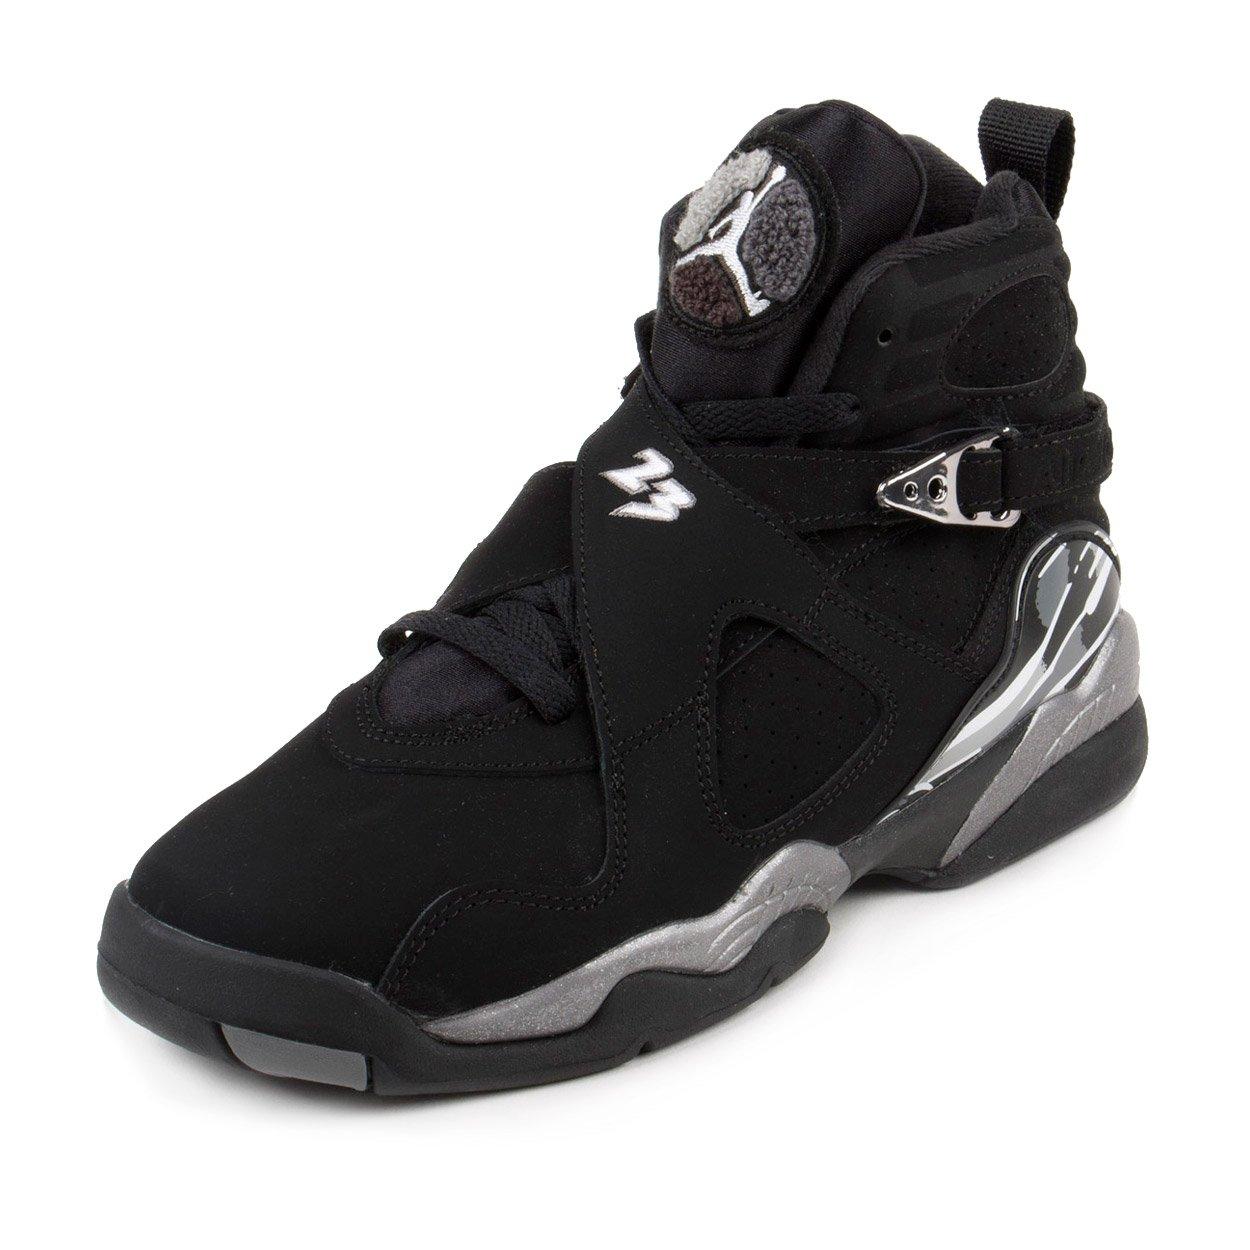 Nike Jordan Kids Jordan Air Jordan 8 Retro Bg Black/White/Lt Graphite Basketball Shoe 5.5 Kids US